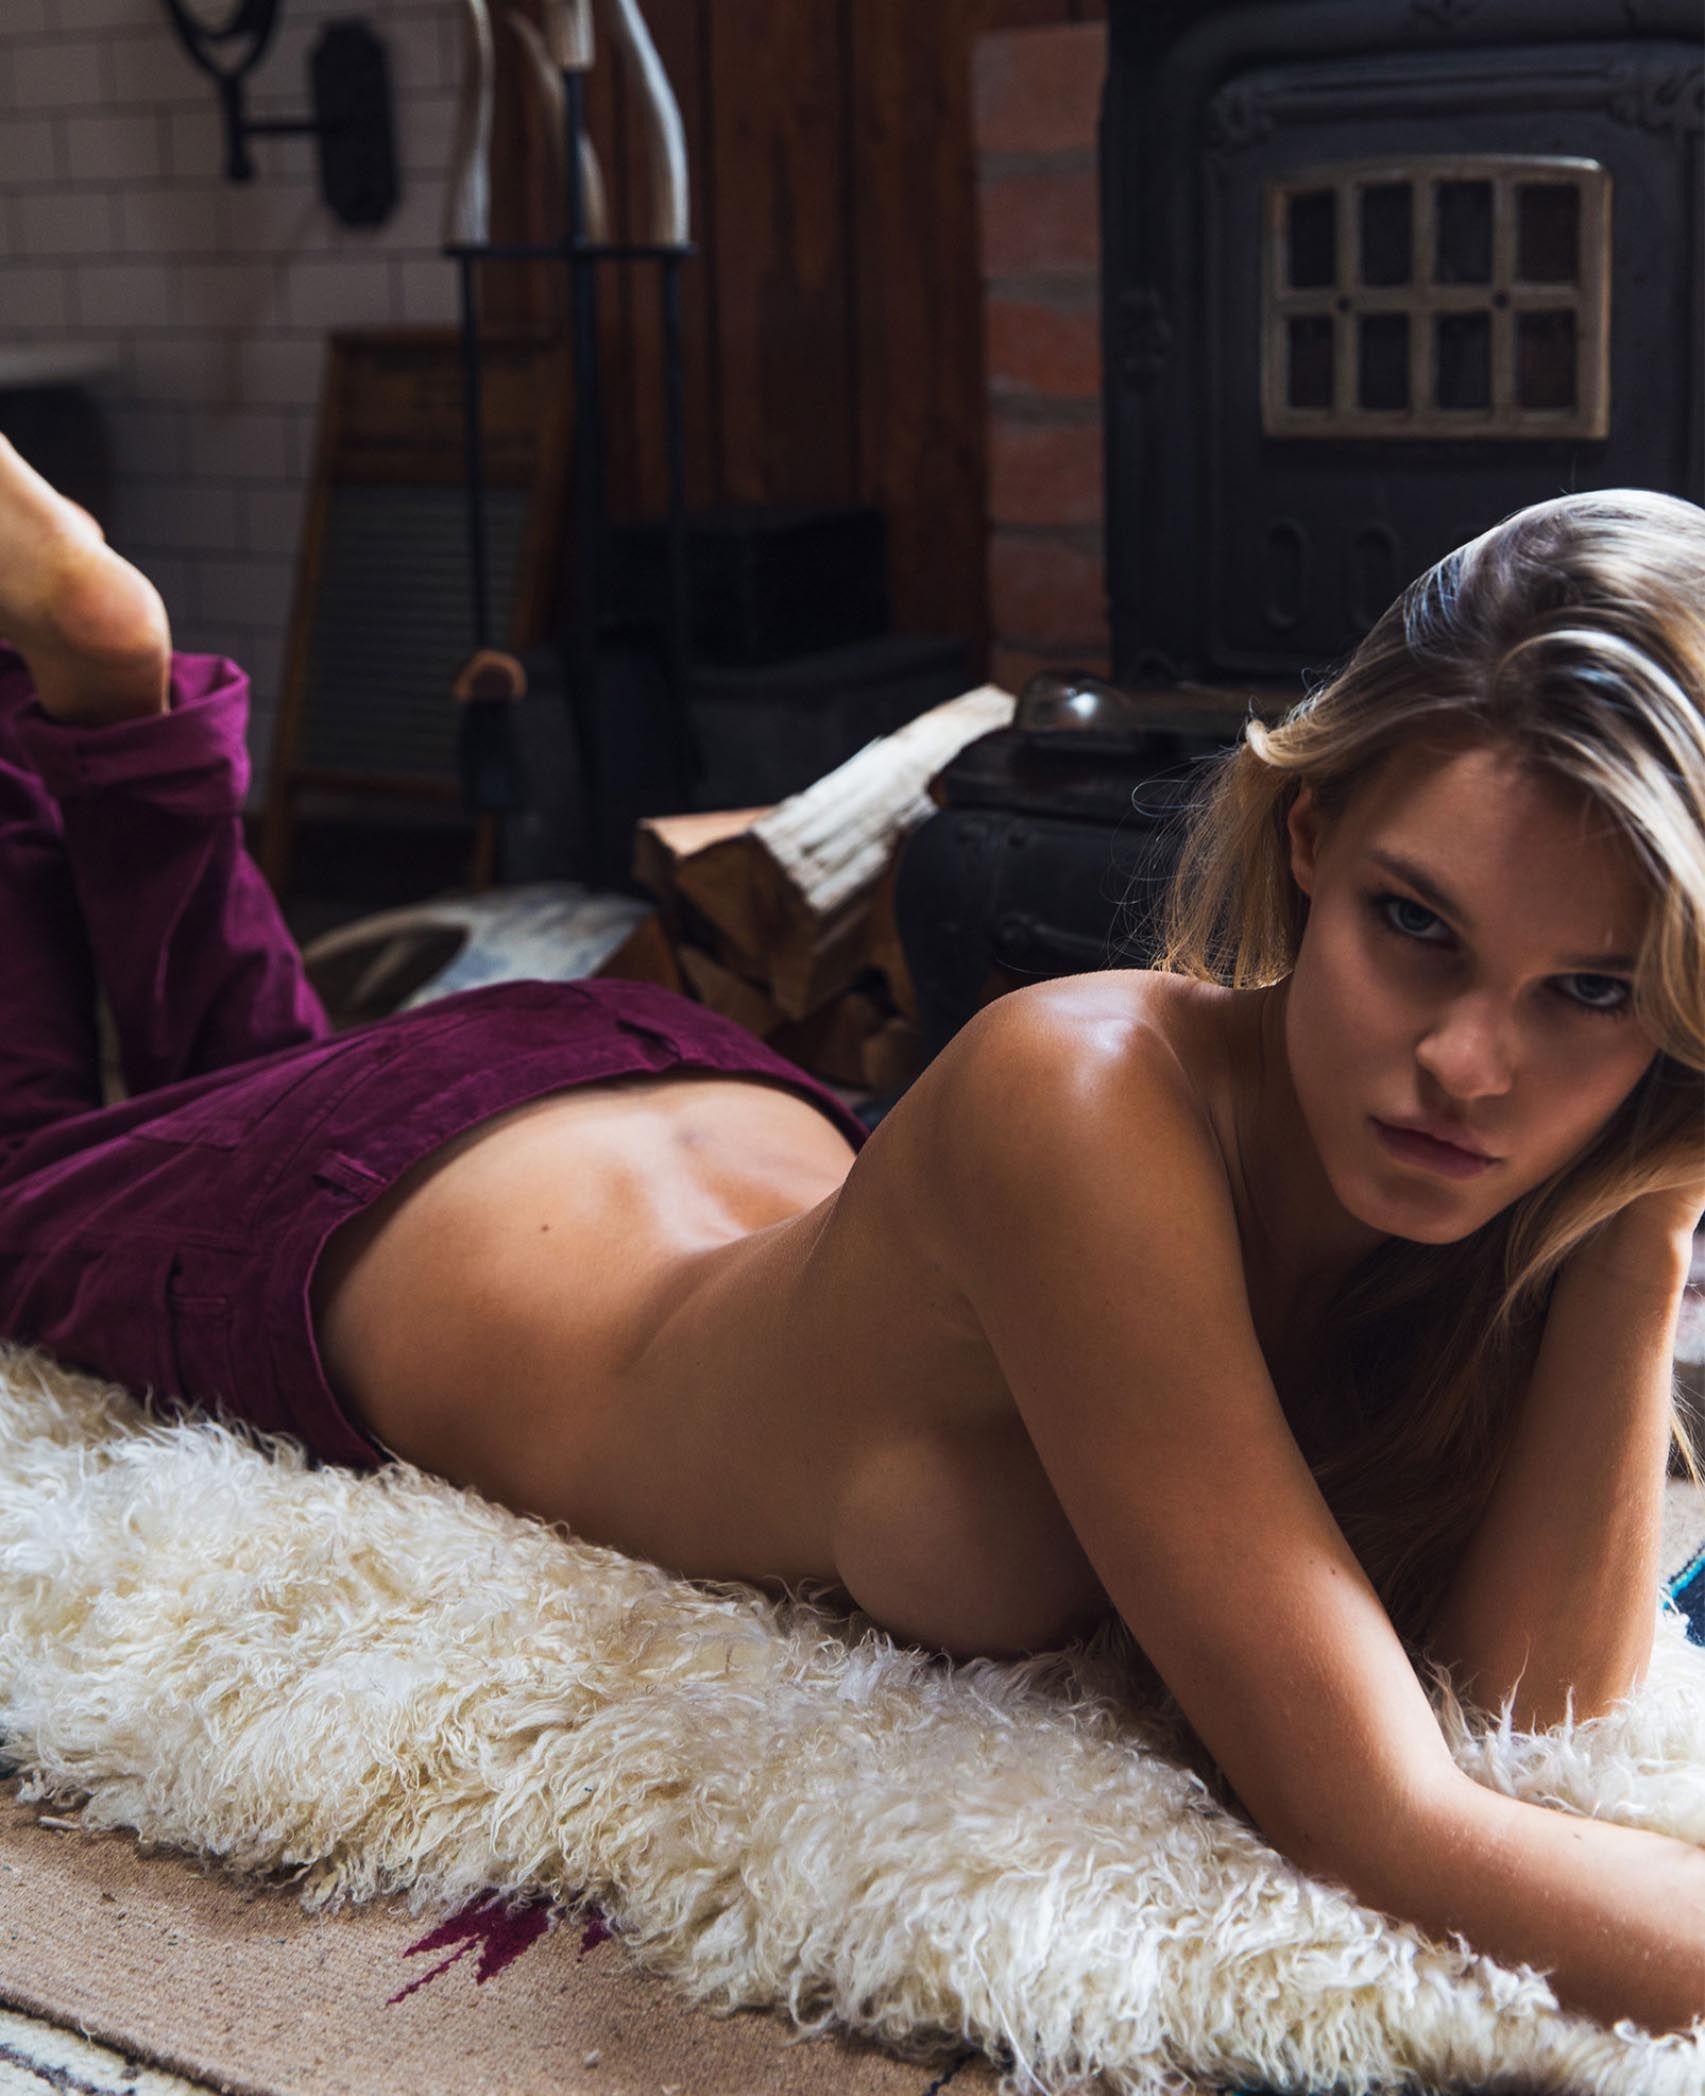 Ass Joy Corrigan nudes (52 photo), Pussy, Paparazzi, Instagram, braless 2006